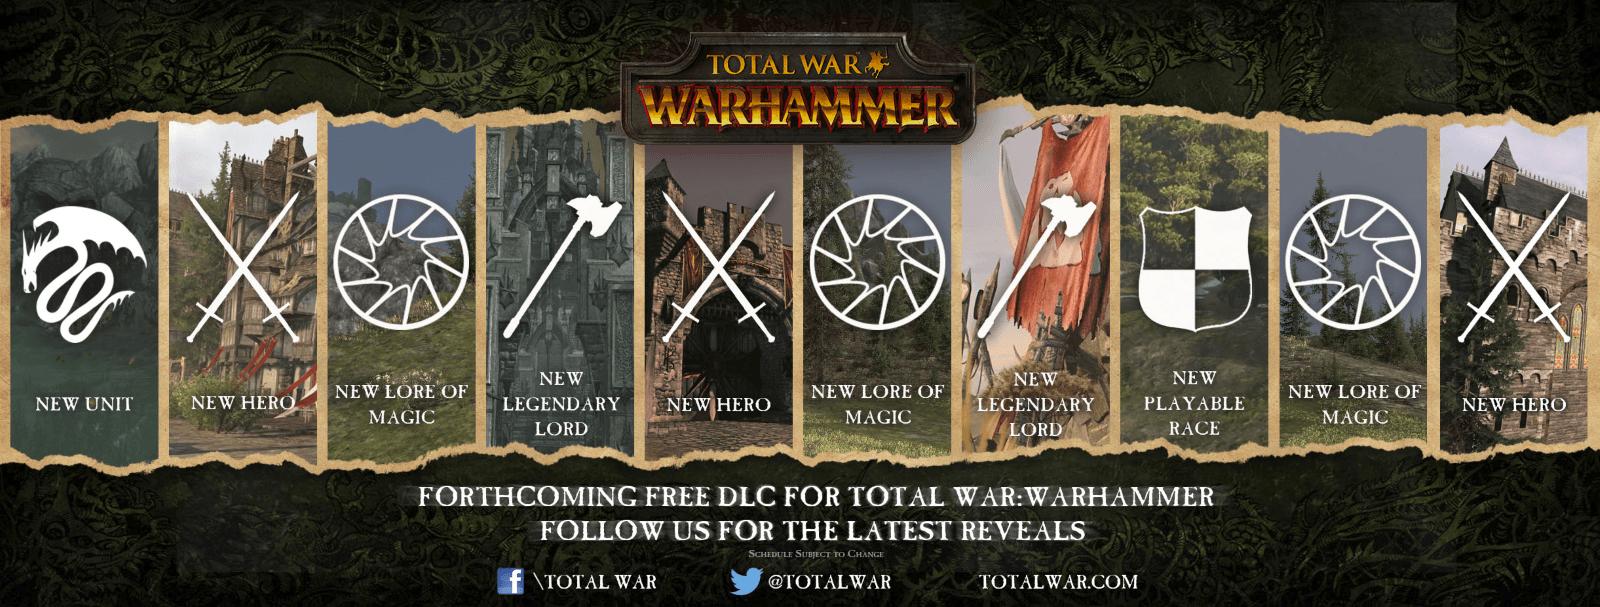 Total War: Warhammer Free DLC Plans Announced